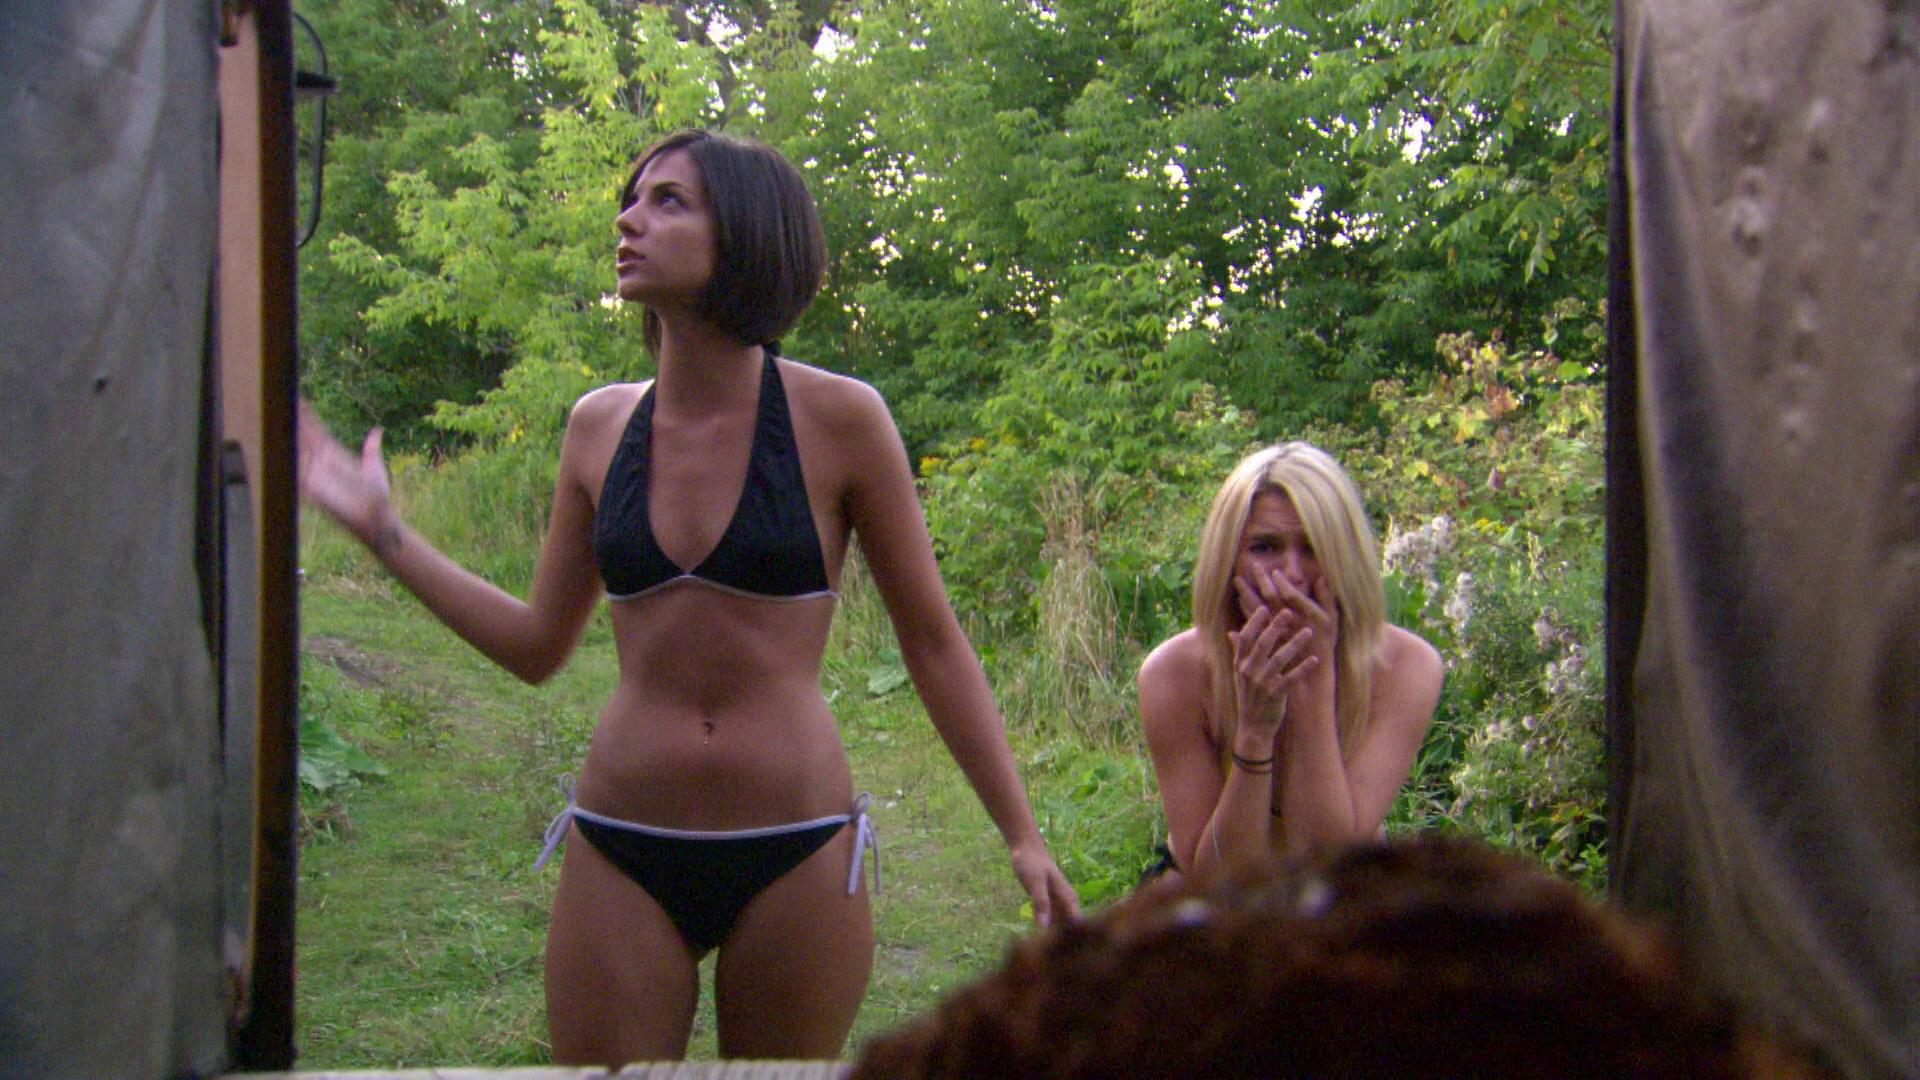 Girls On Girls Scope On IceMovie IceMovie Bikini Bikini 76ygIYfbv